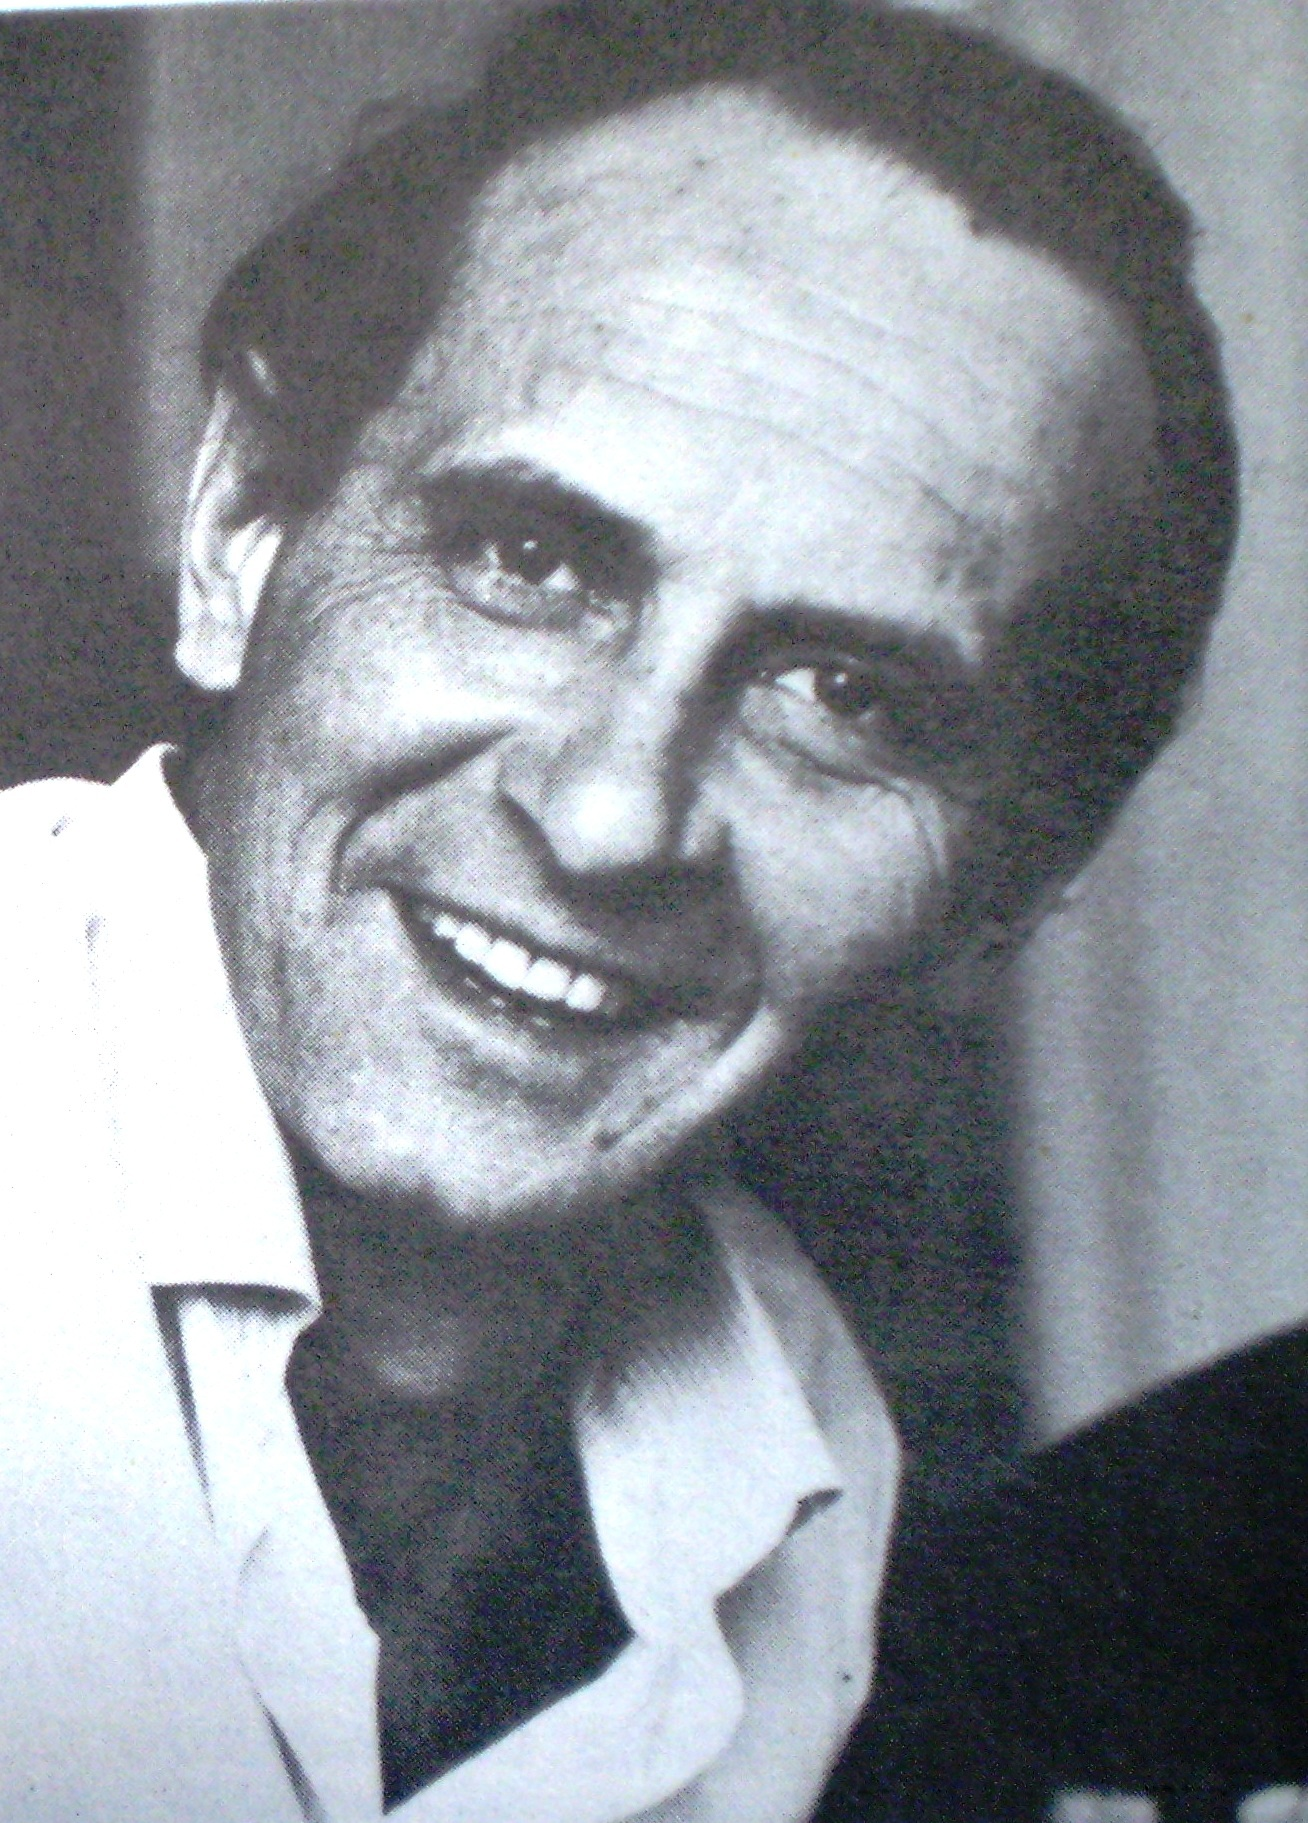 https://upload.wikimedia.org/wikipedia/commons/8/82/RicardoCarpani.JPG